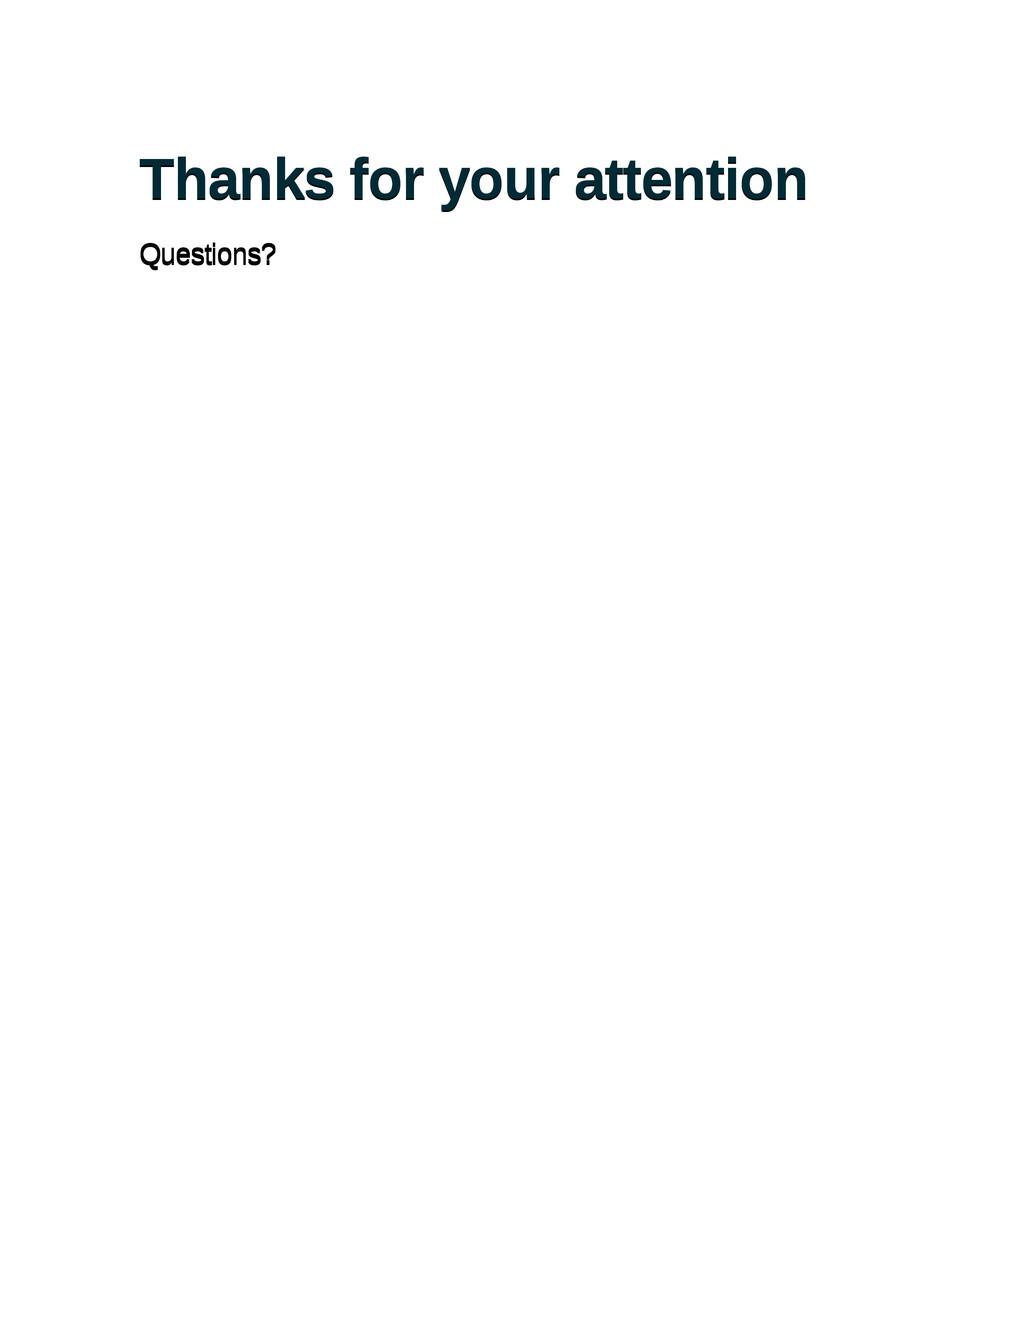 Thanks for your attention Thanks for your atten...